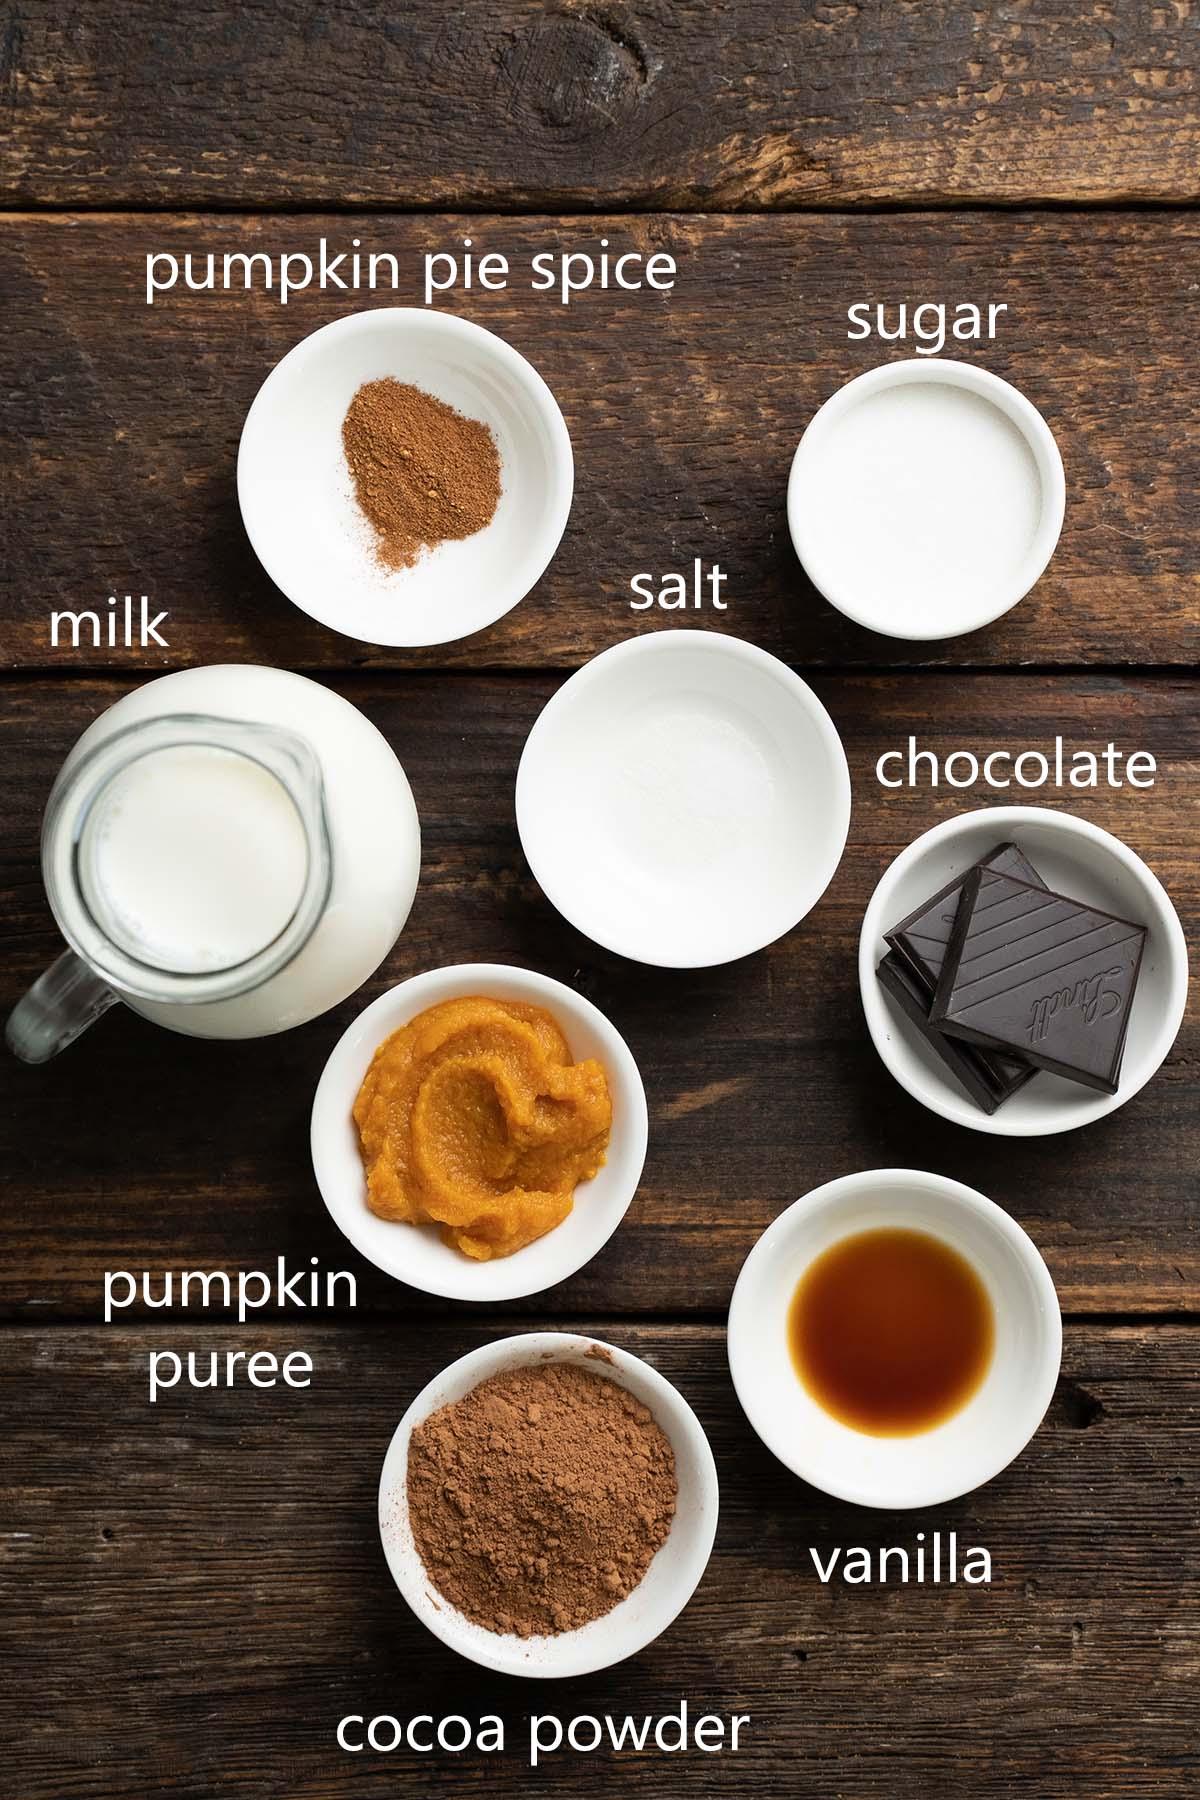 pumpkin spice hot chocolate ingredients